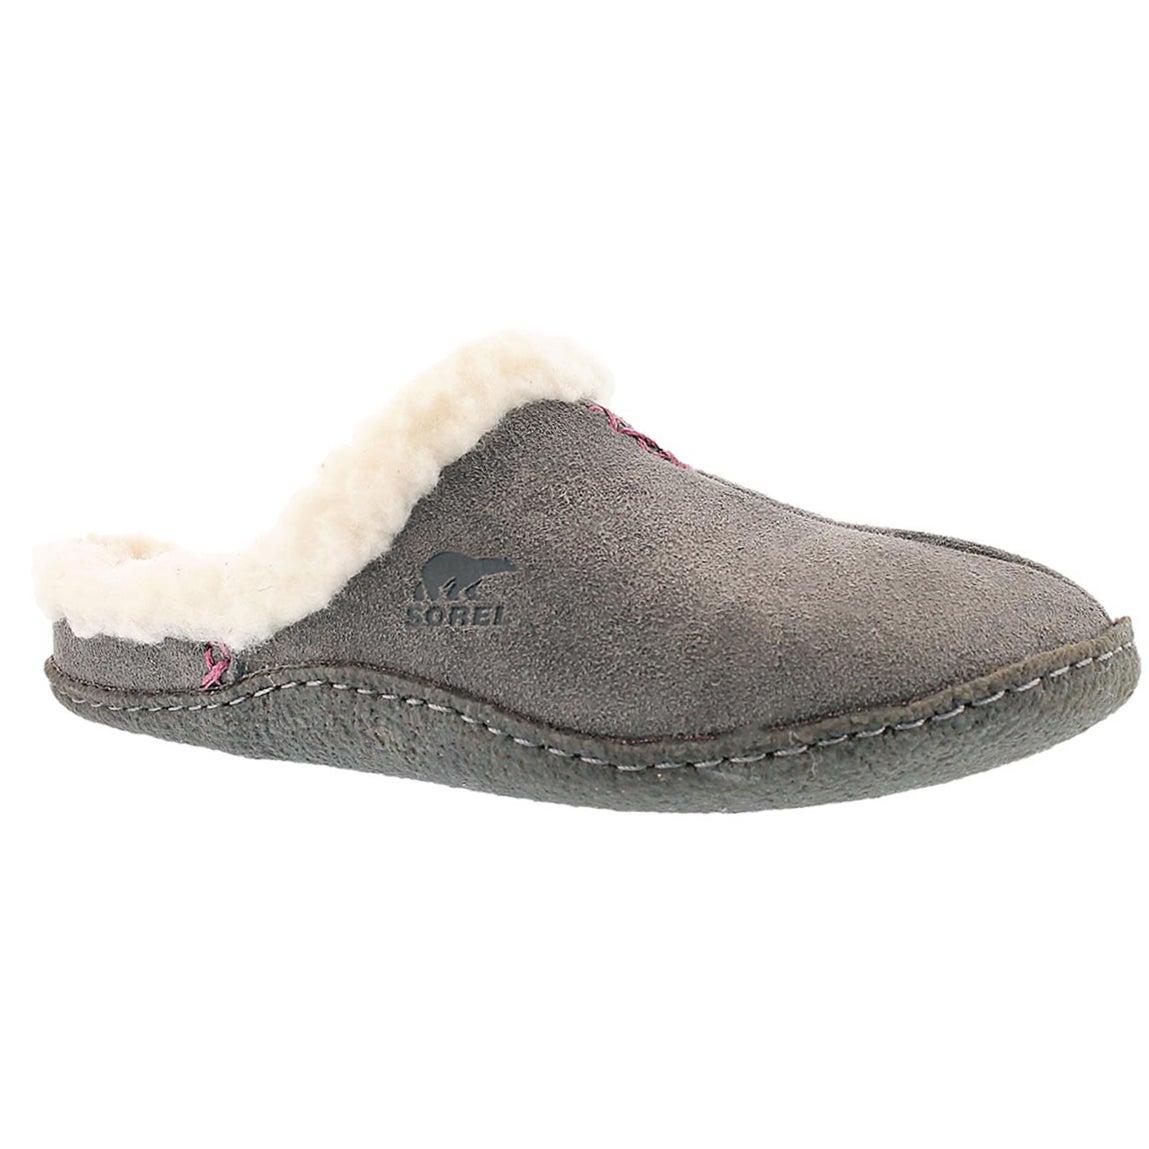 Women's NAKISKA SLIDE shale suede slippers